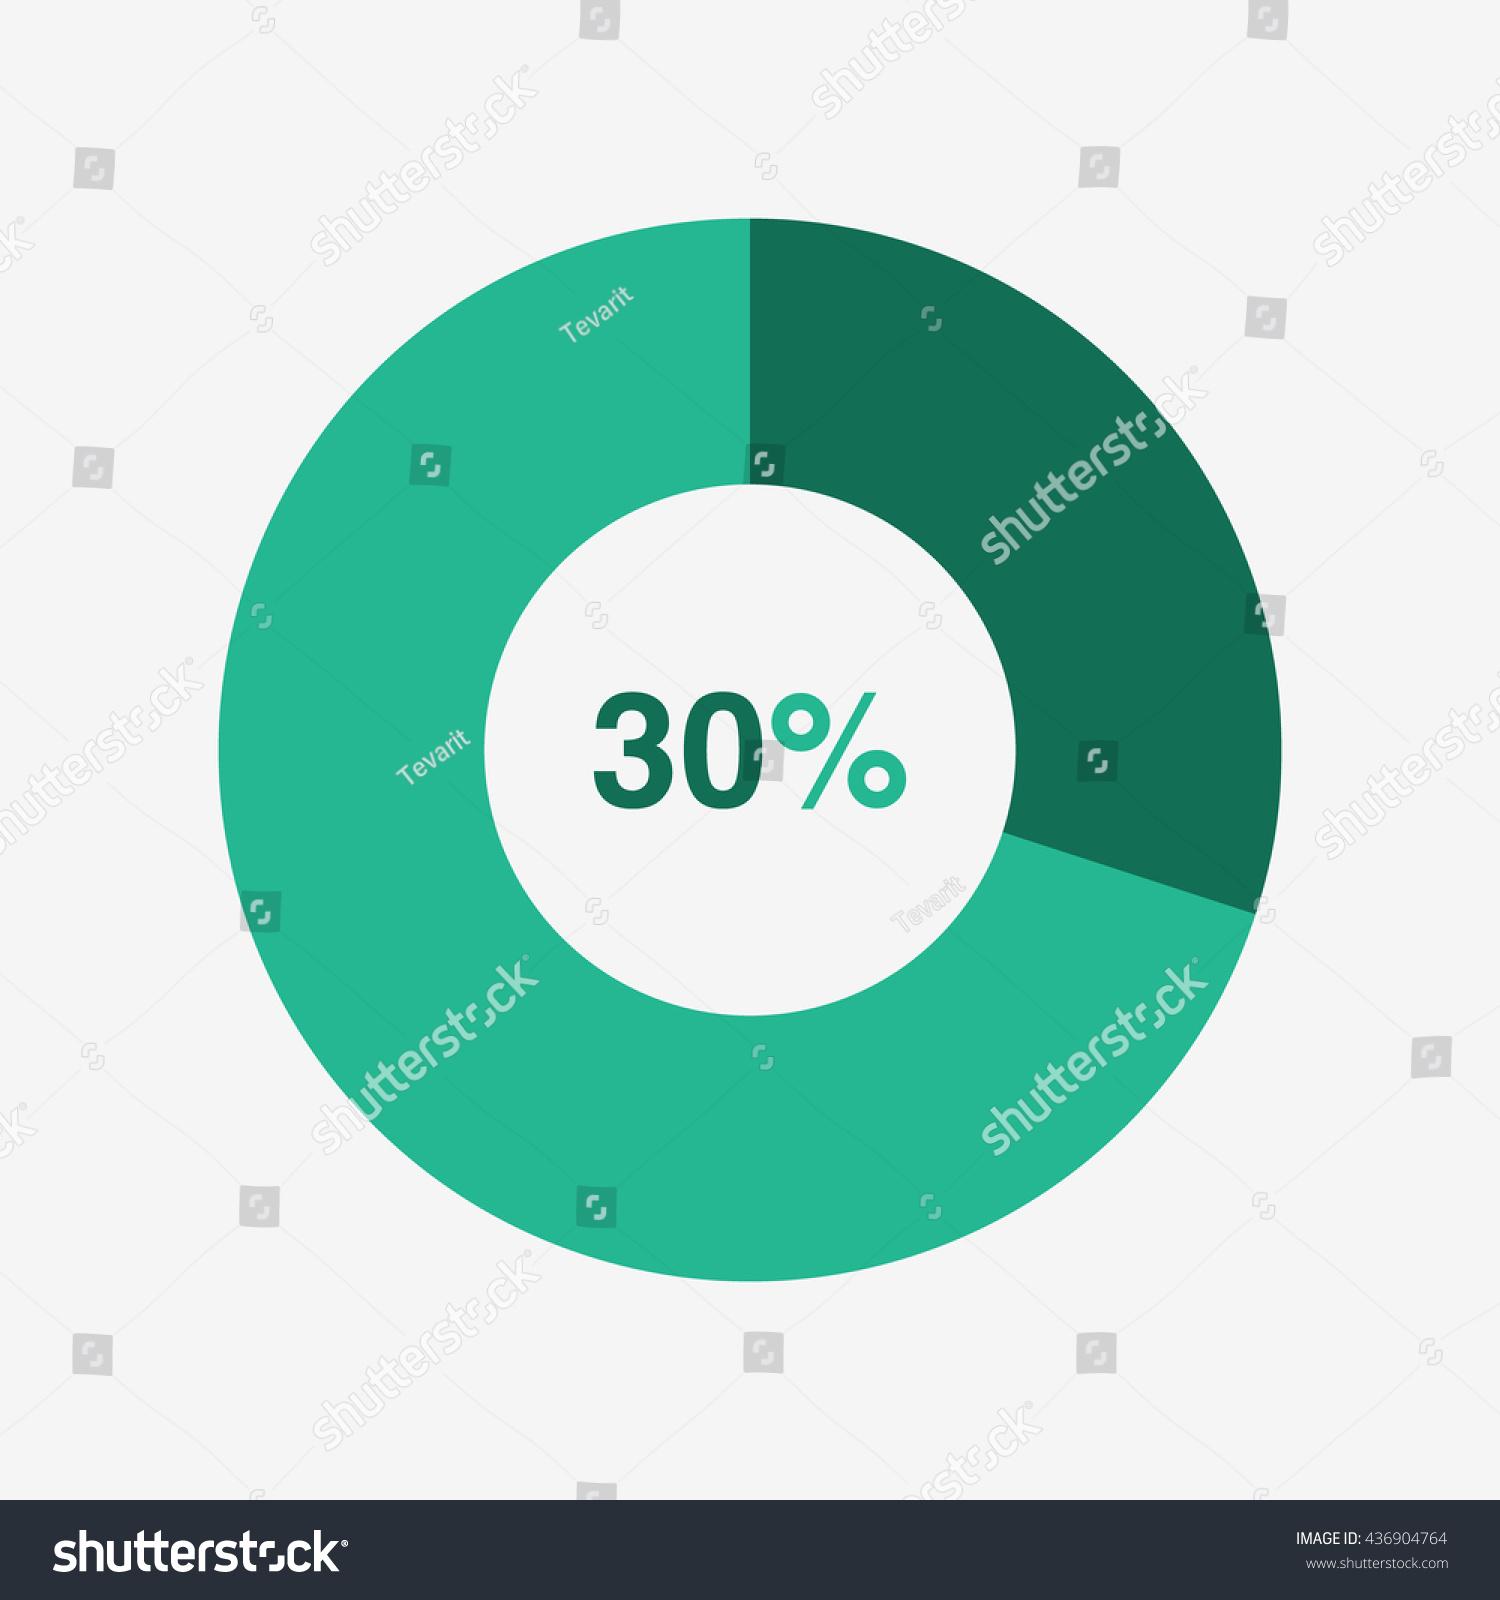 Icon pie green light green chart stock vector 436904764 shutterstock icon pie green and light green chart 30 percent pie chart vector nvjuhfo Choice Image